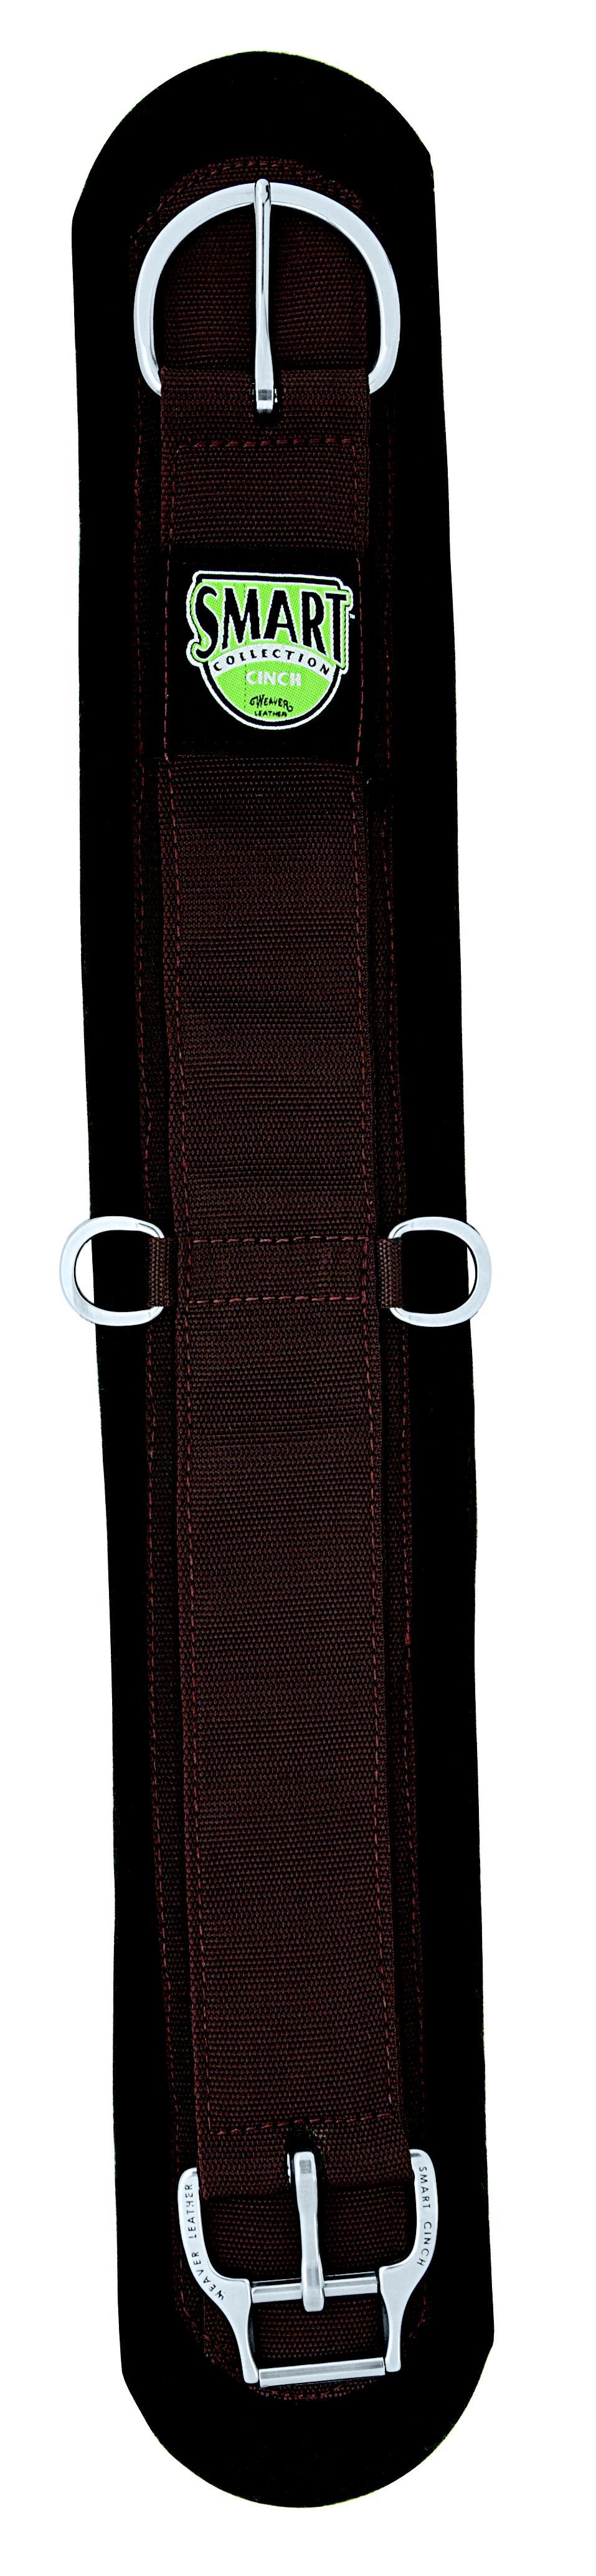 Weaver Leather Felt Lined Straight Smart Cinch